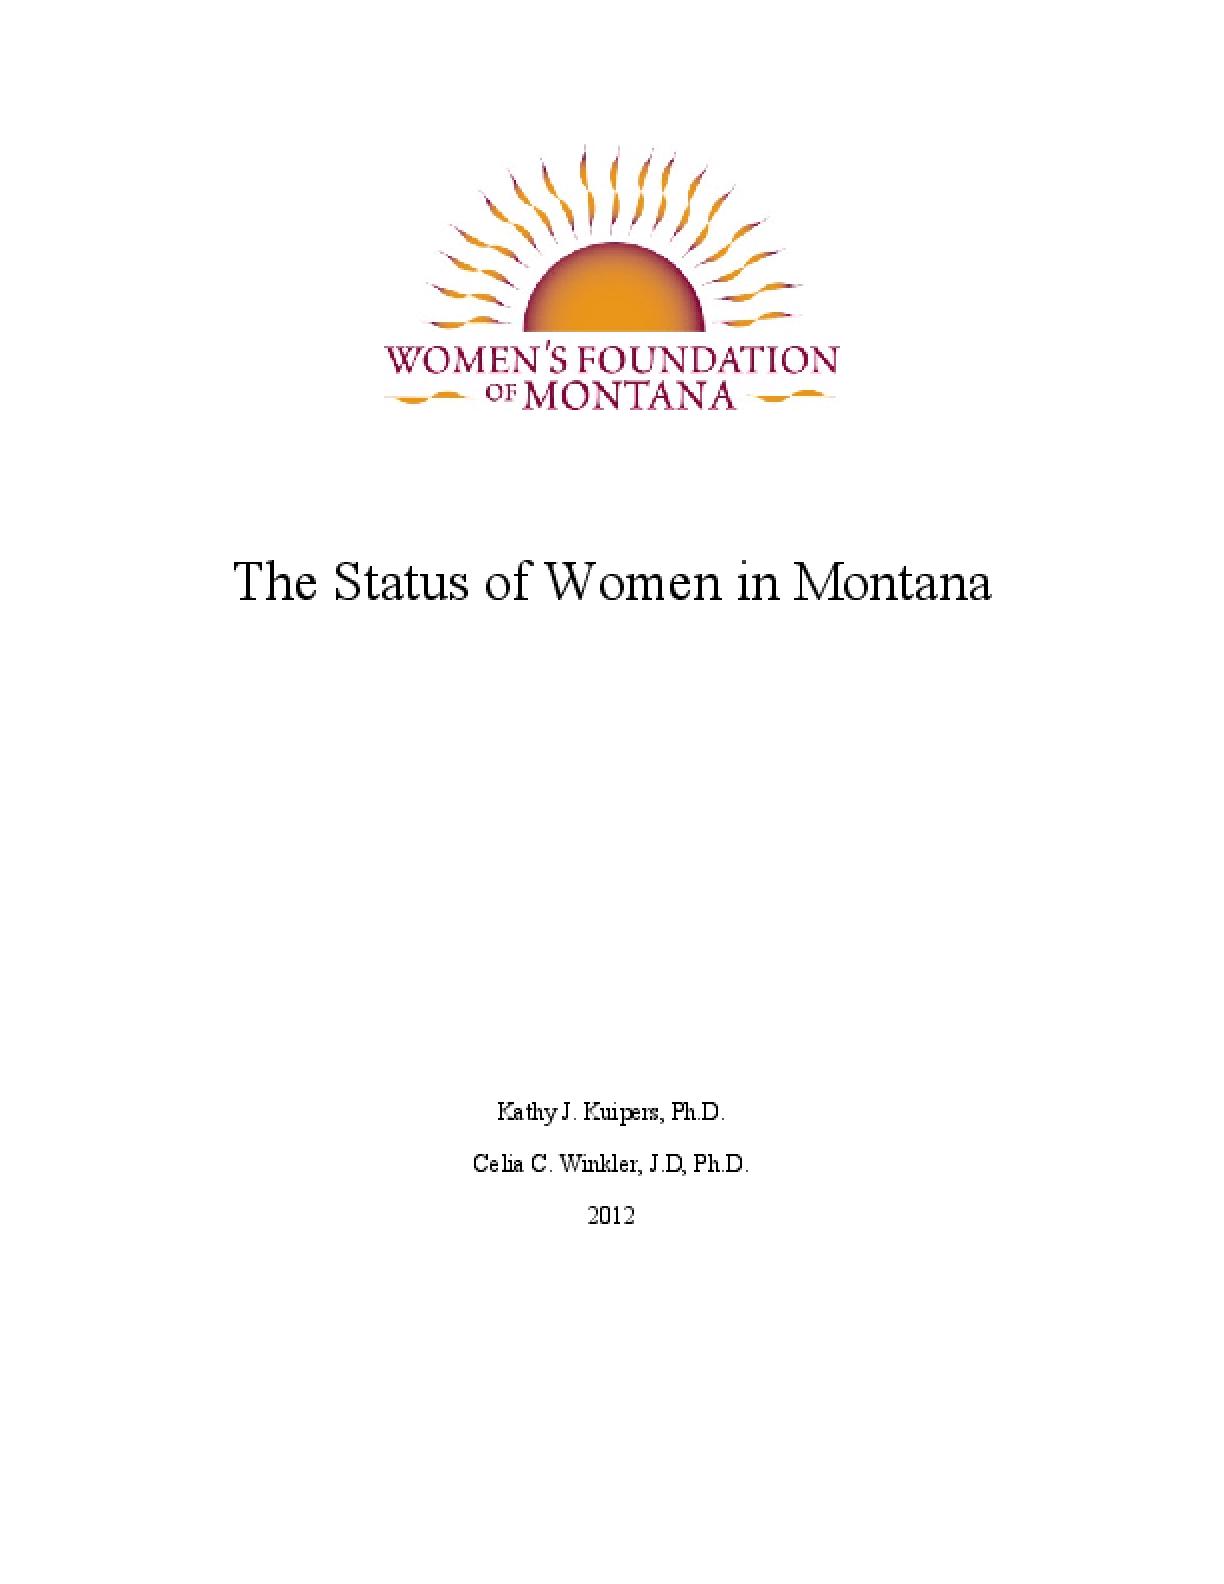 Status of Women in Montana Report 2012